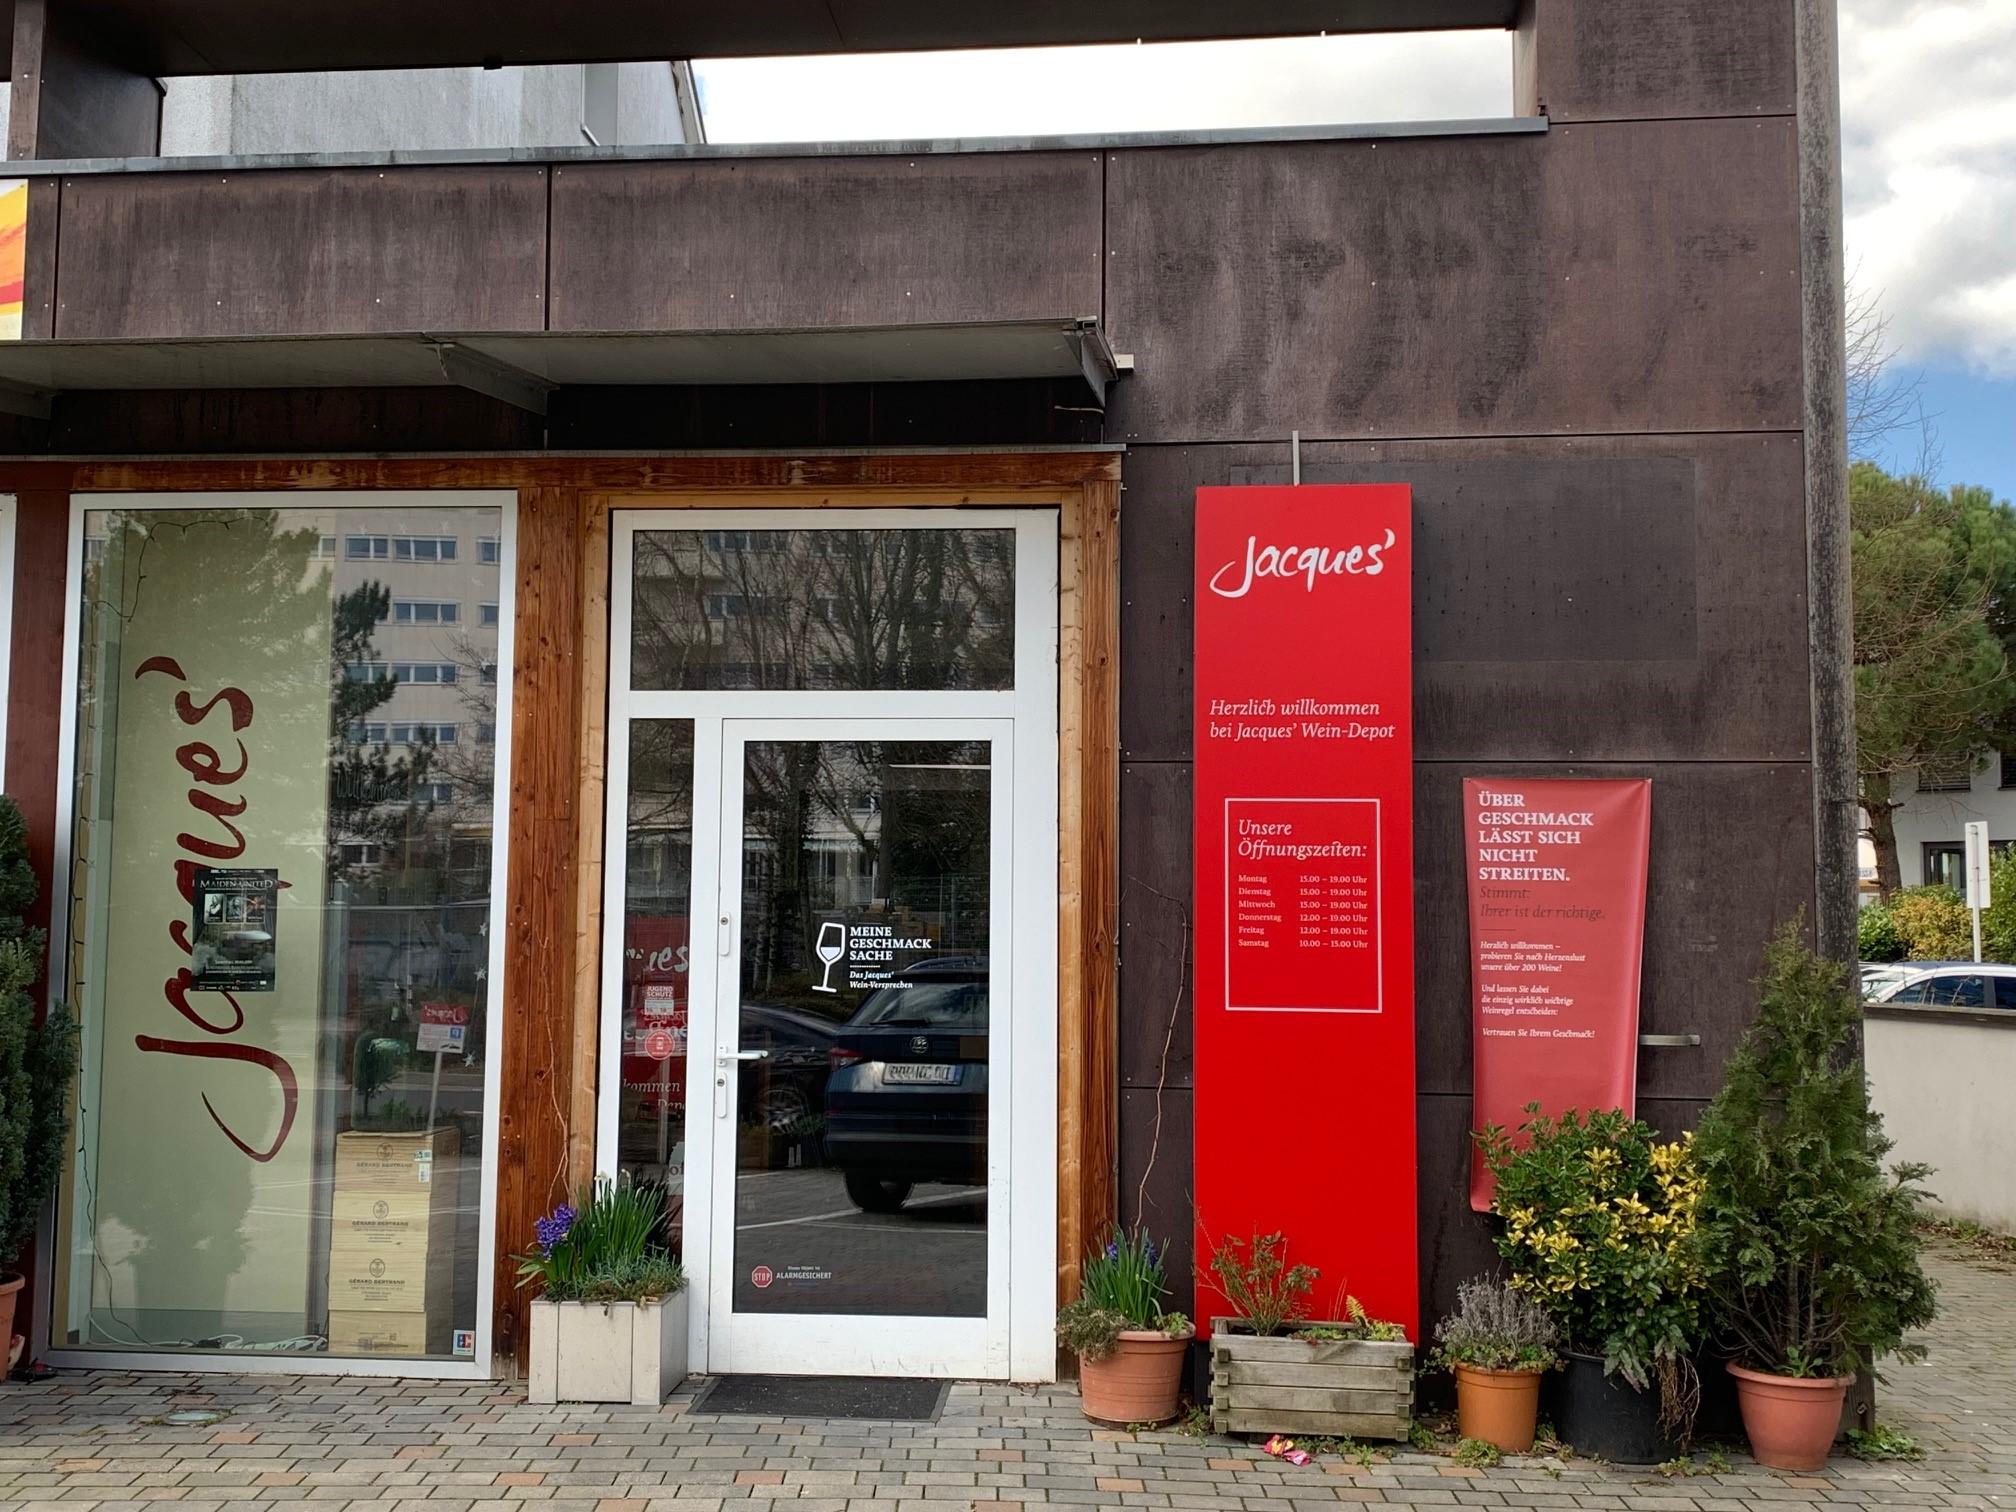 Jacques Wein Depot 10 Fotos Bad Homburg Urseler Straße Golocal